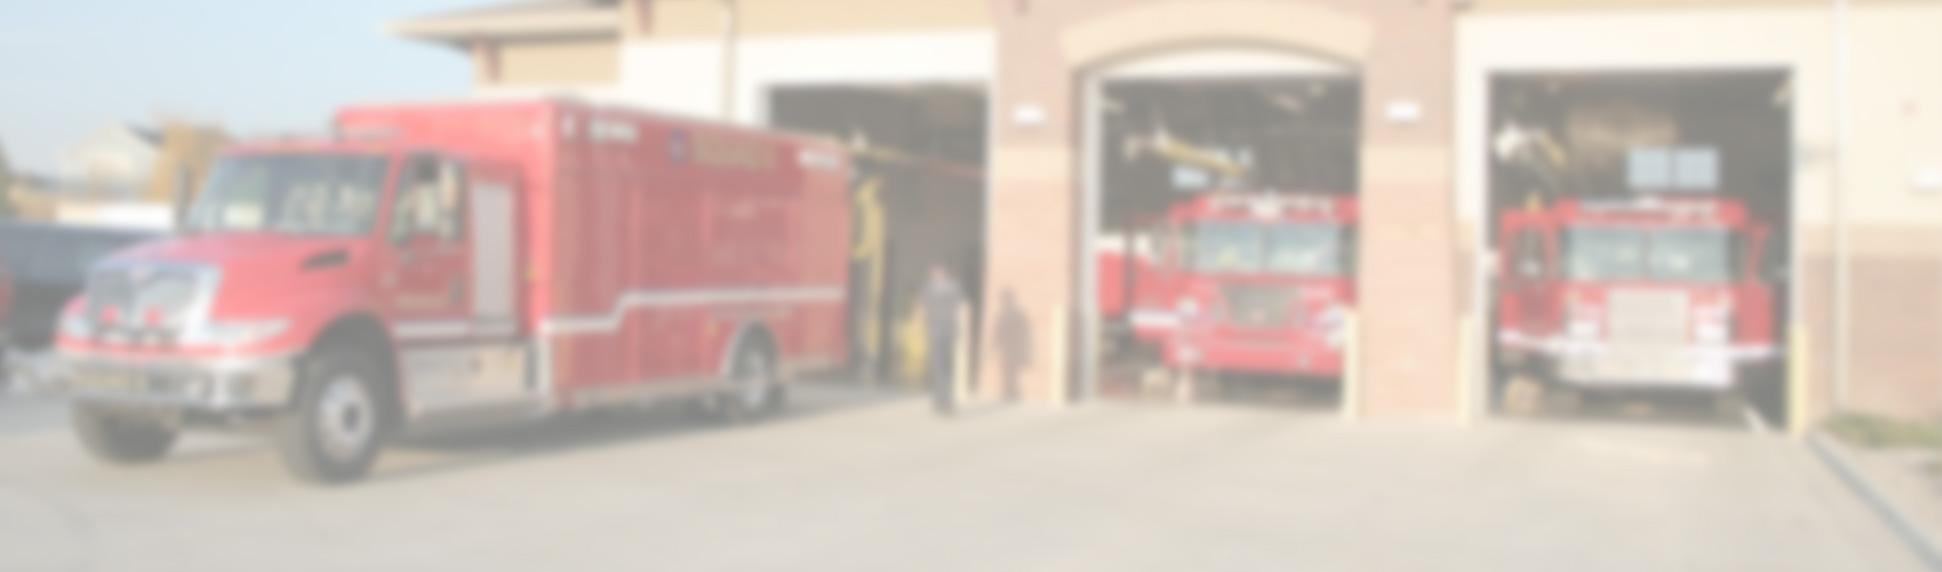 Minnesota-Fire-Station